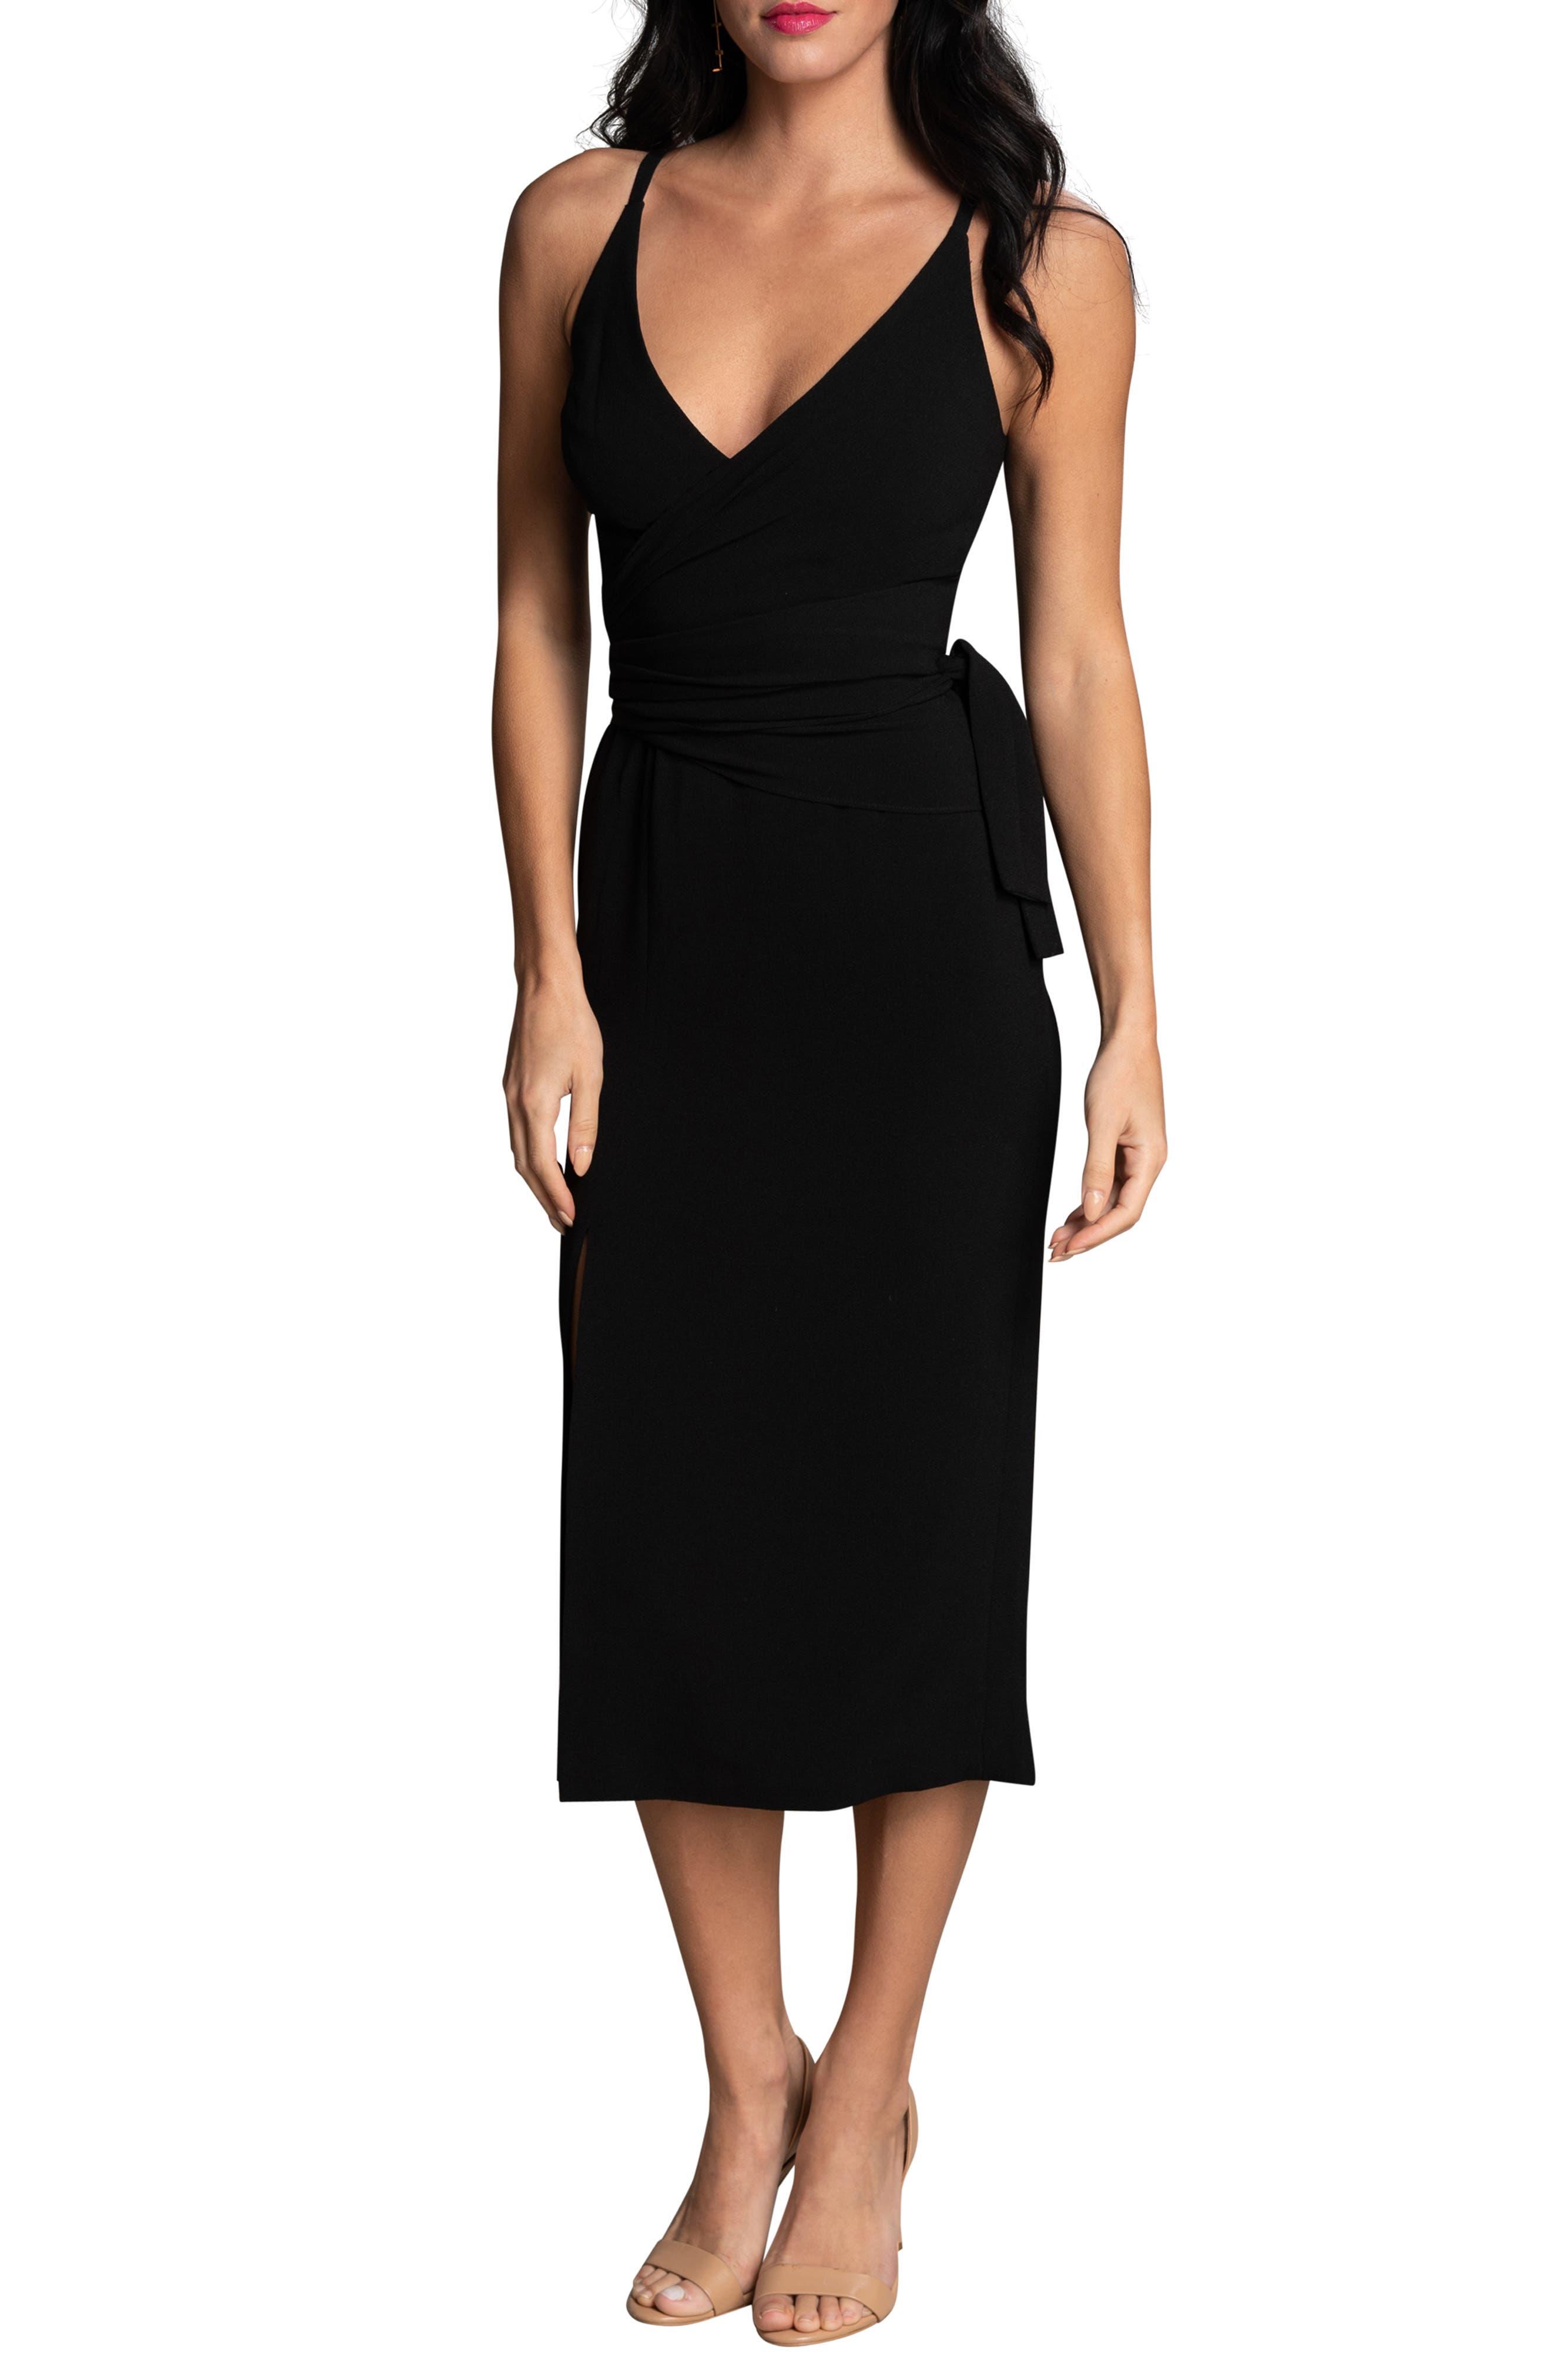 Kiara Side Bow Body-Con Cocktail Dress